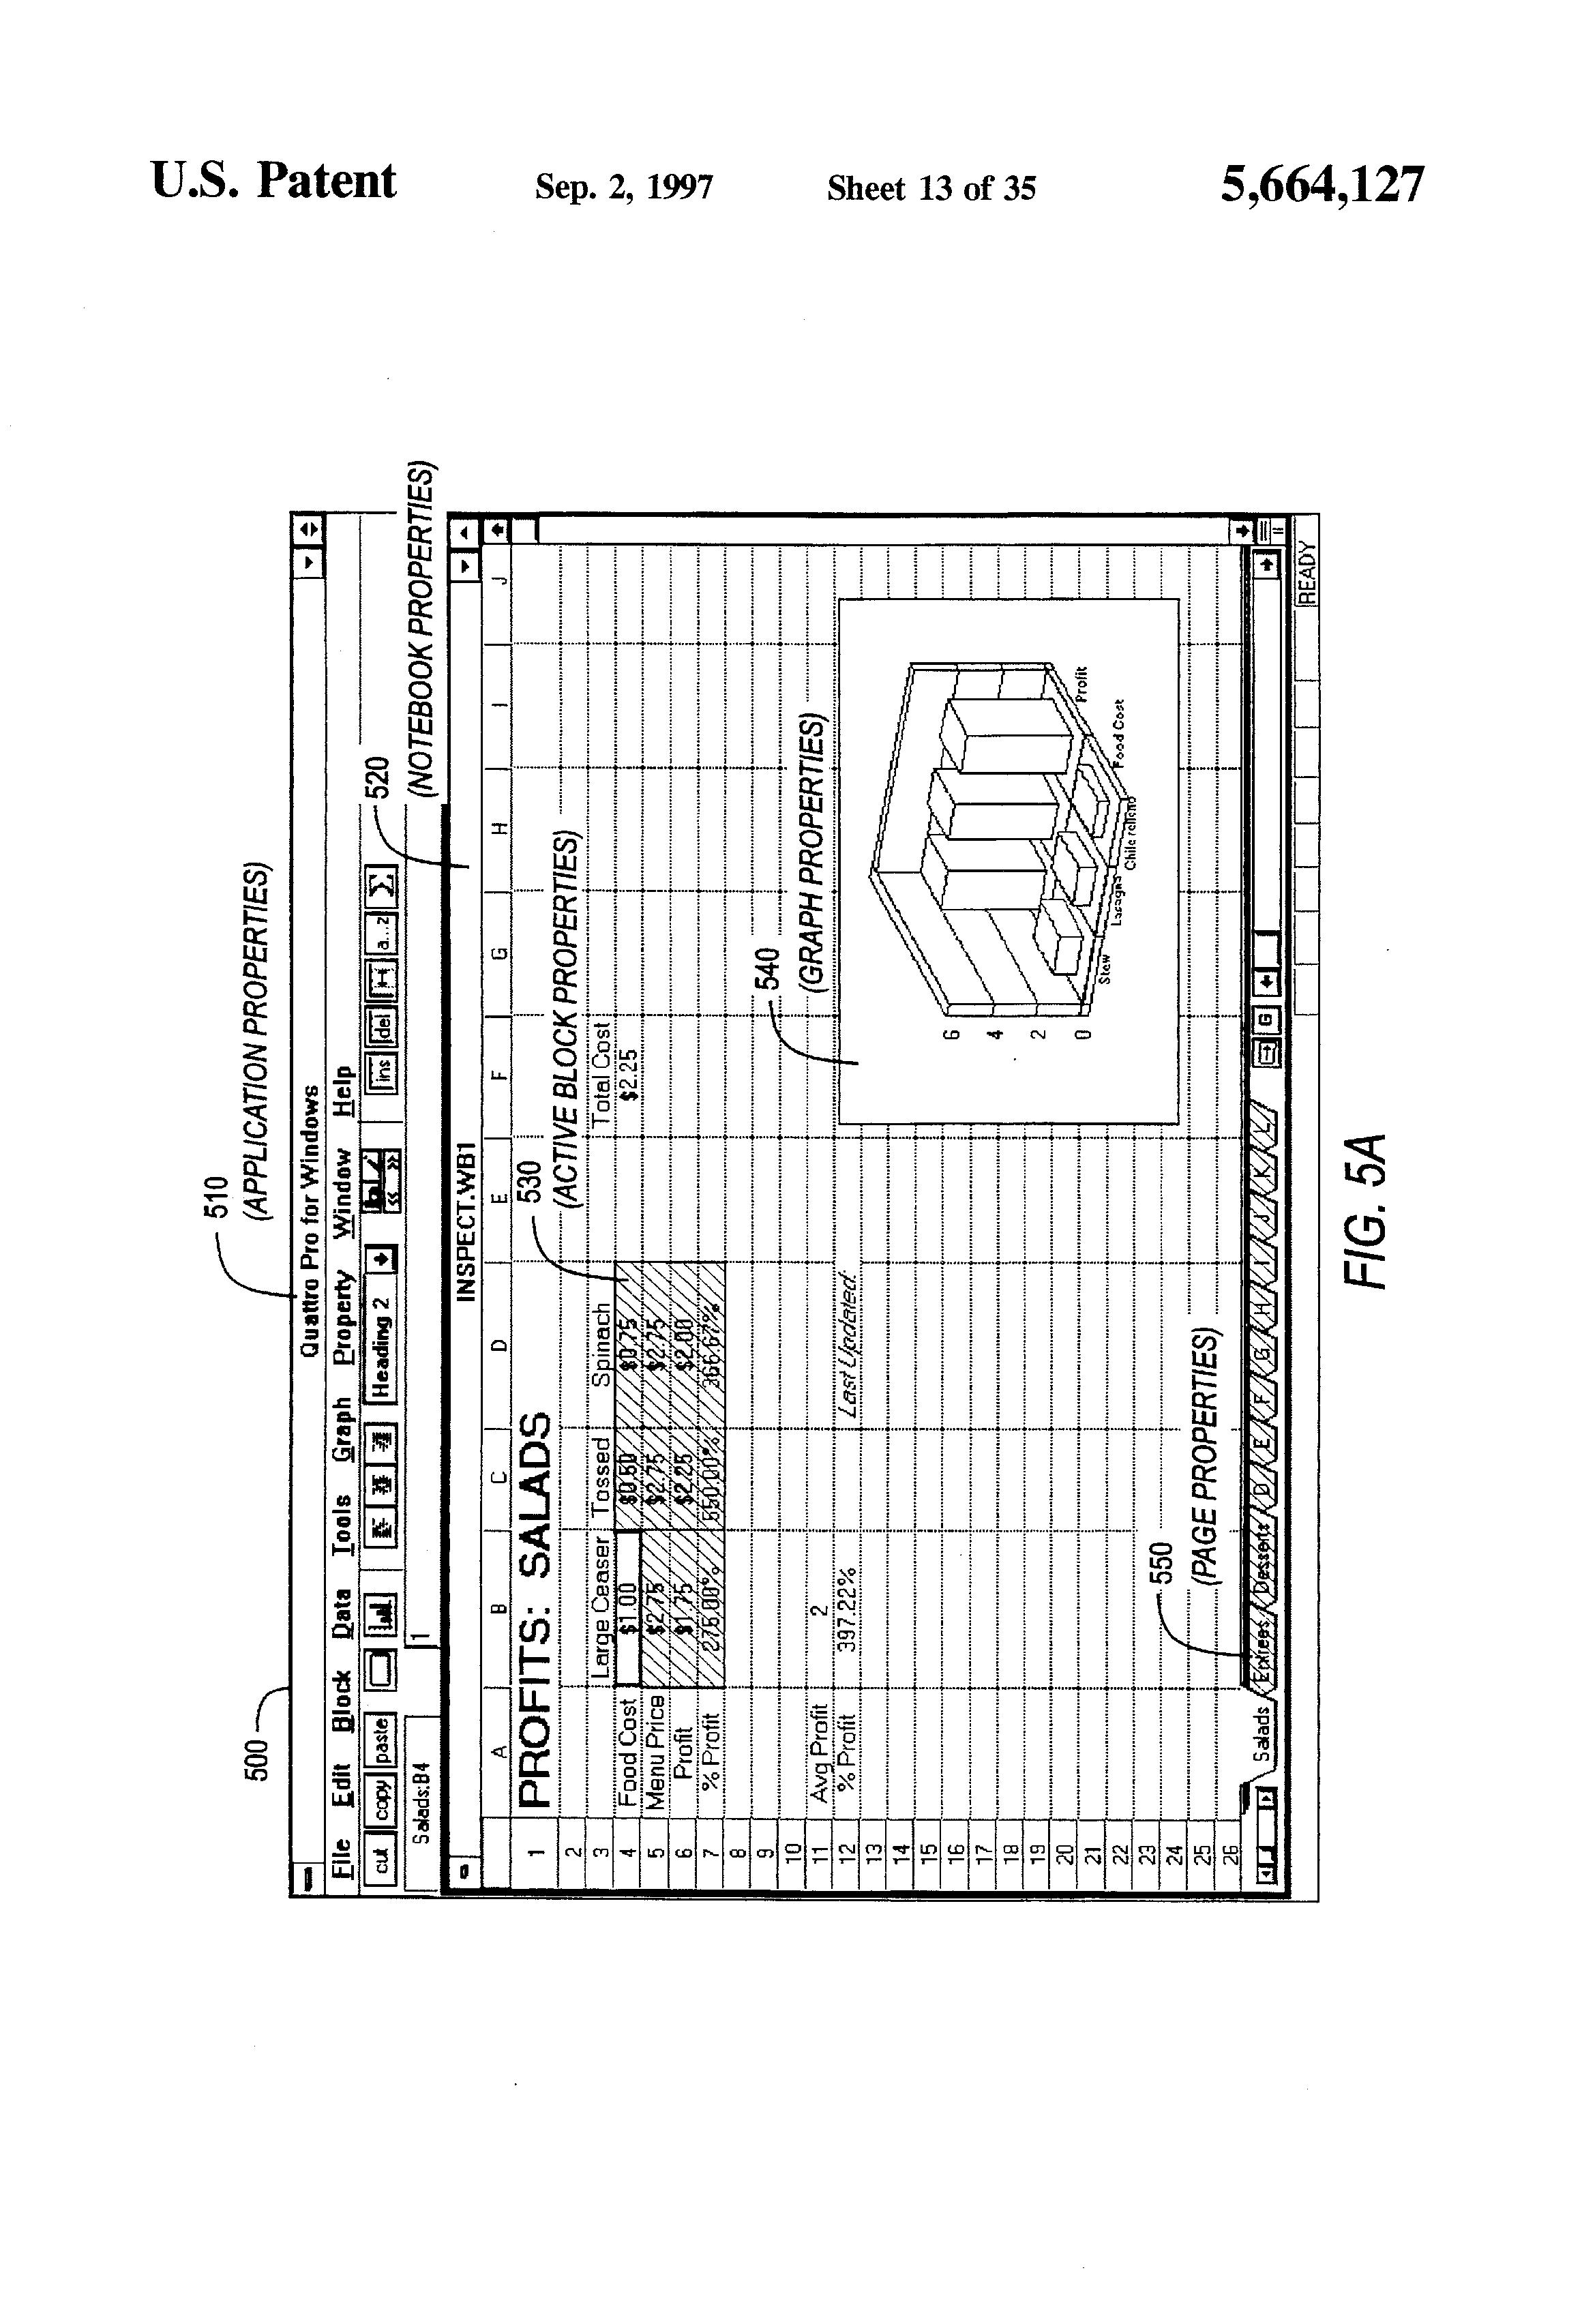 Wiring Diagram Further Mark Murray Wiring Harness Wiring Diagram